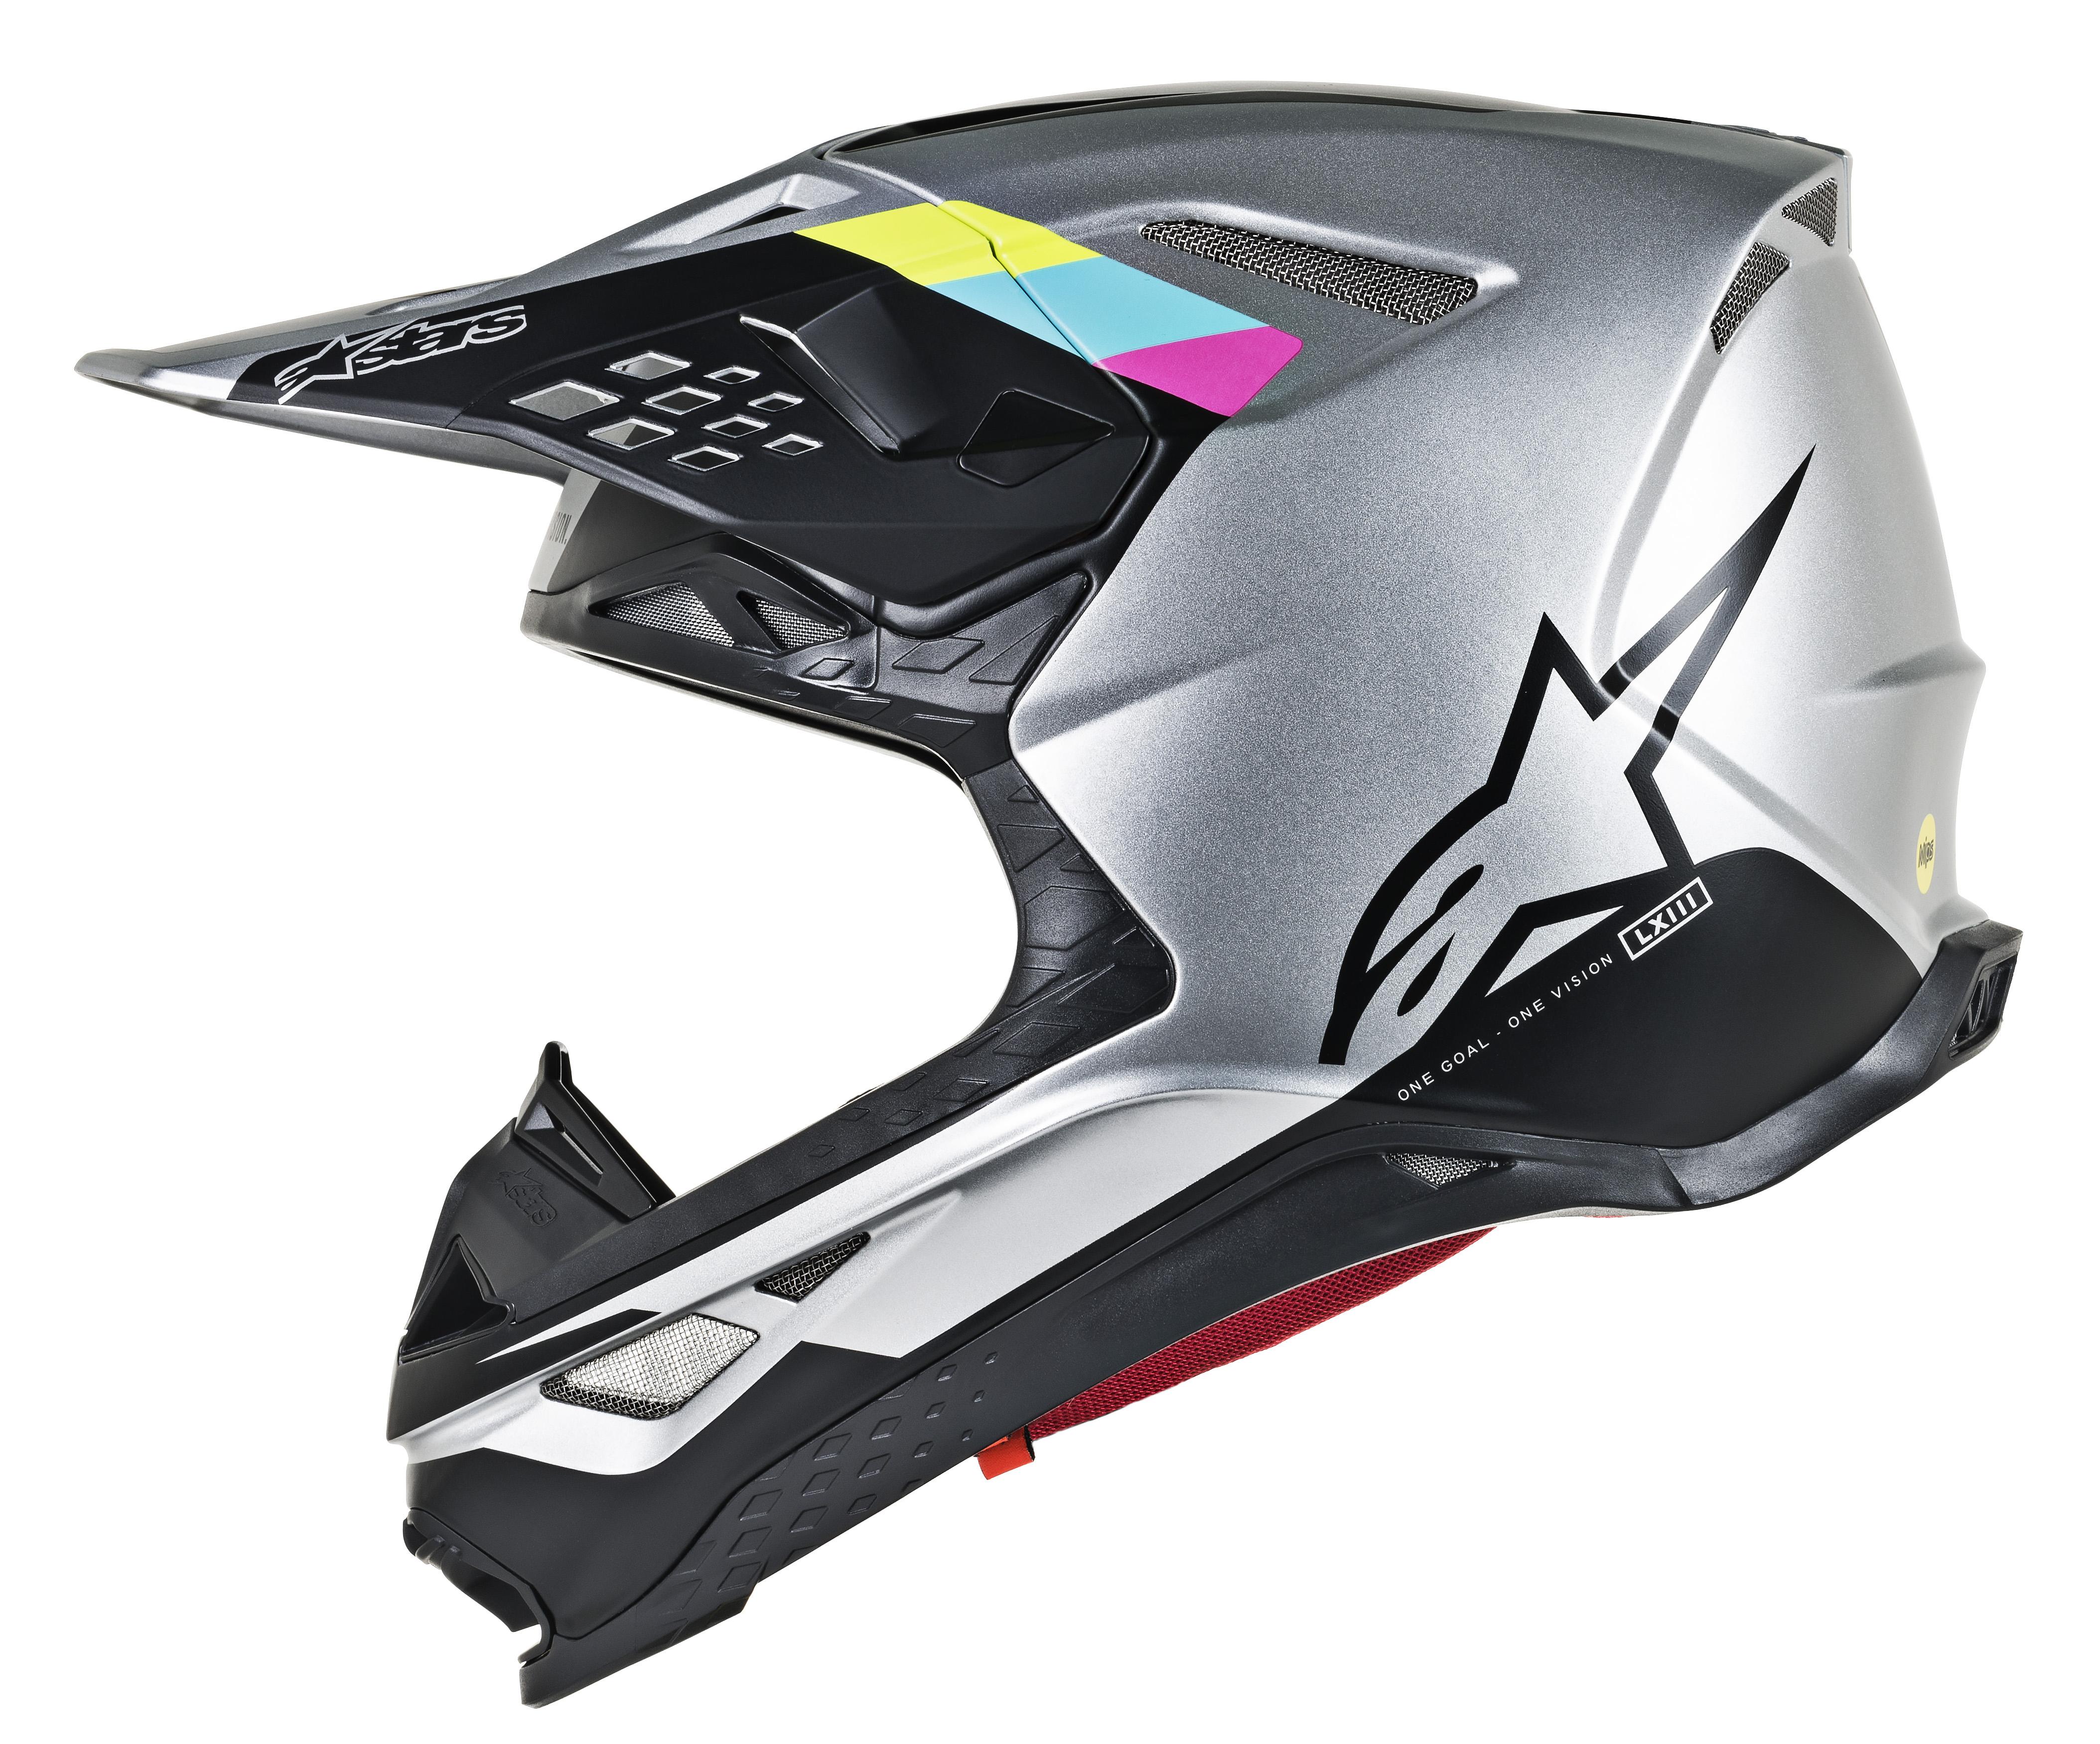 8300619 191 R2 Supertech S M8 Contact Helmet